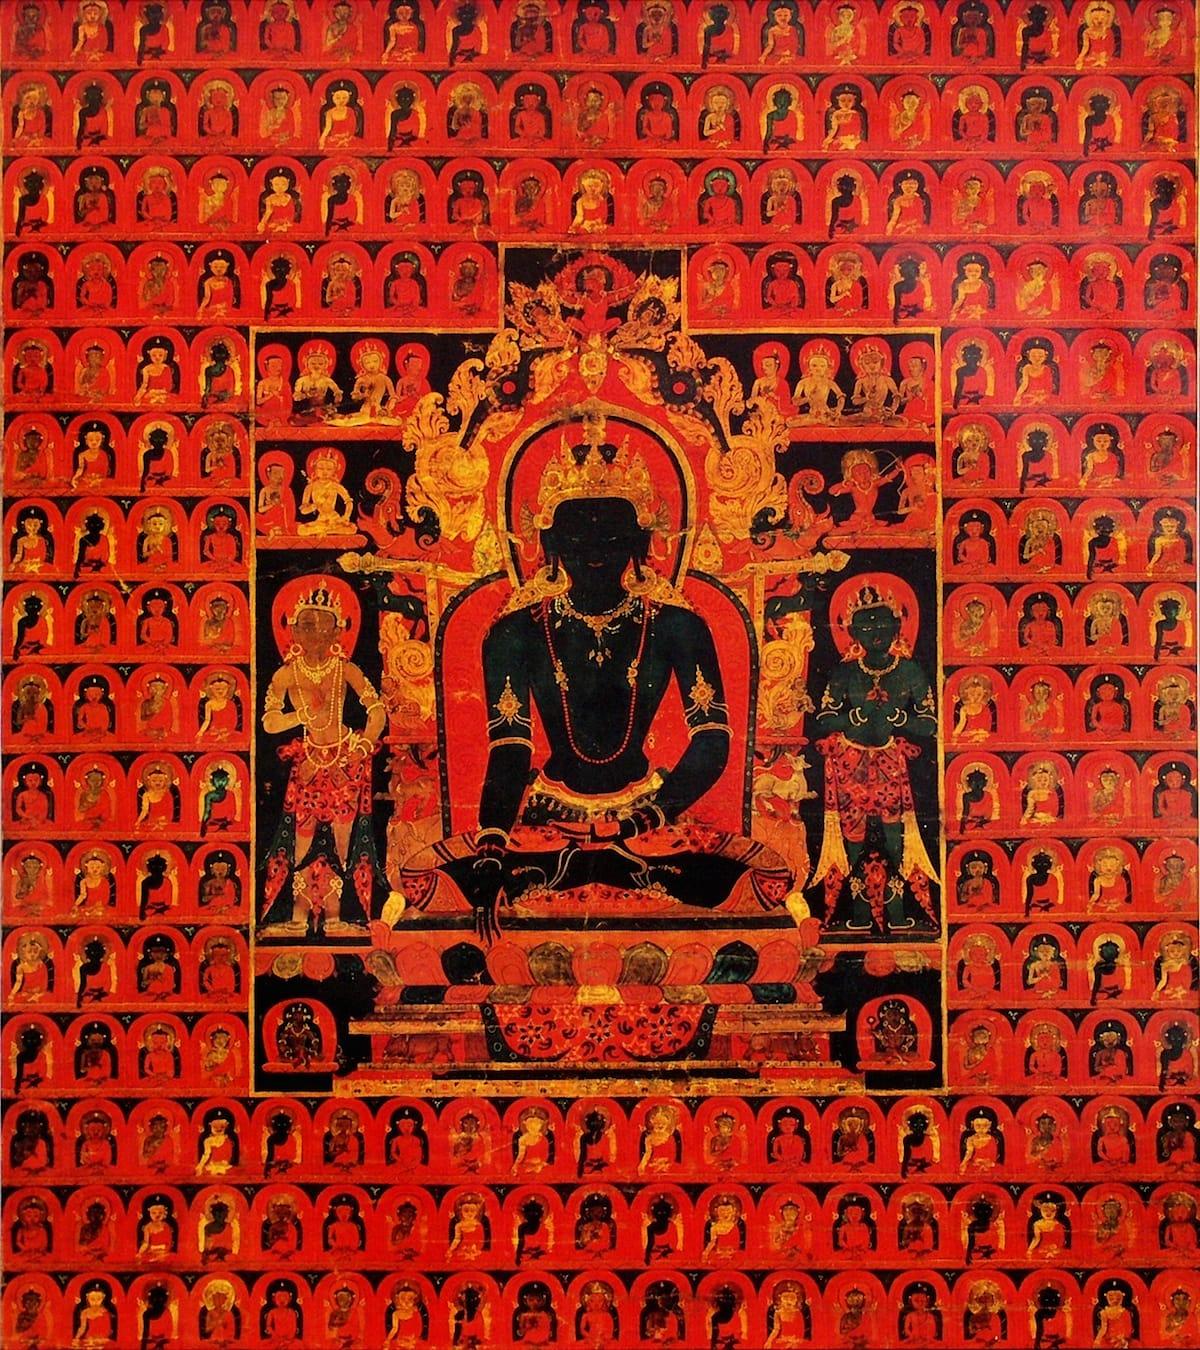 Basics Buddha Families Irini Rockwell Loving-Kindness Shambhala Sun - Nov '02